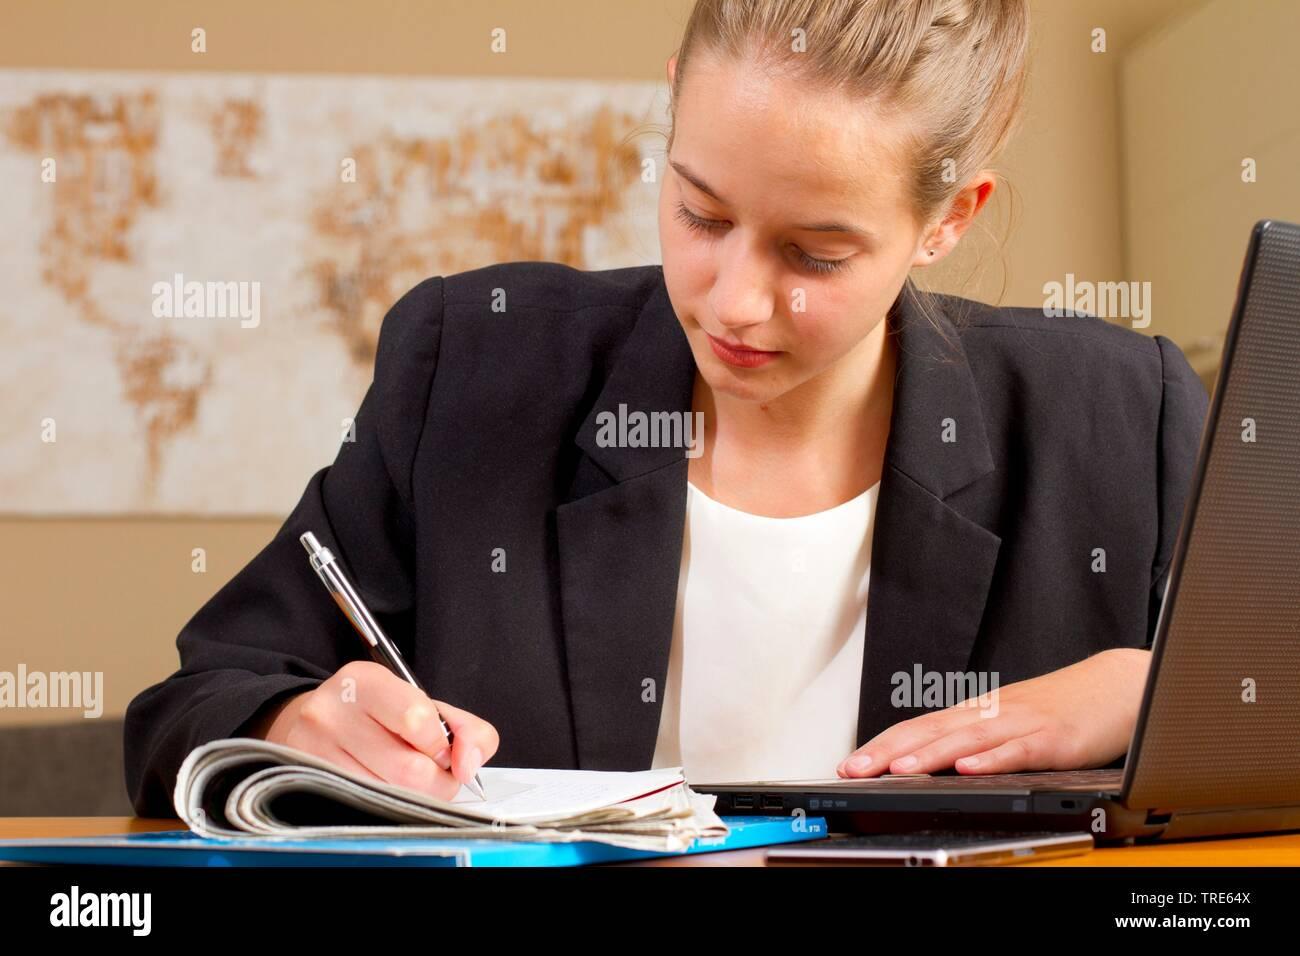 Portraet einer jungen Frau, am Schreibtisch arbeitend | Portrait of a young woman working at a desk | BLWS518265.jpg [ (c) blickwinkel/McPHOTO/A. Pulw - Stock Image